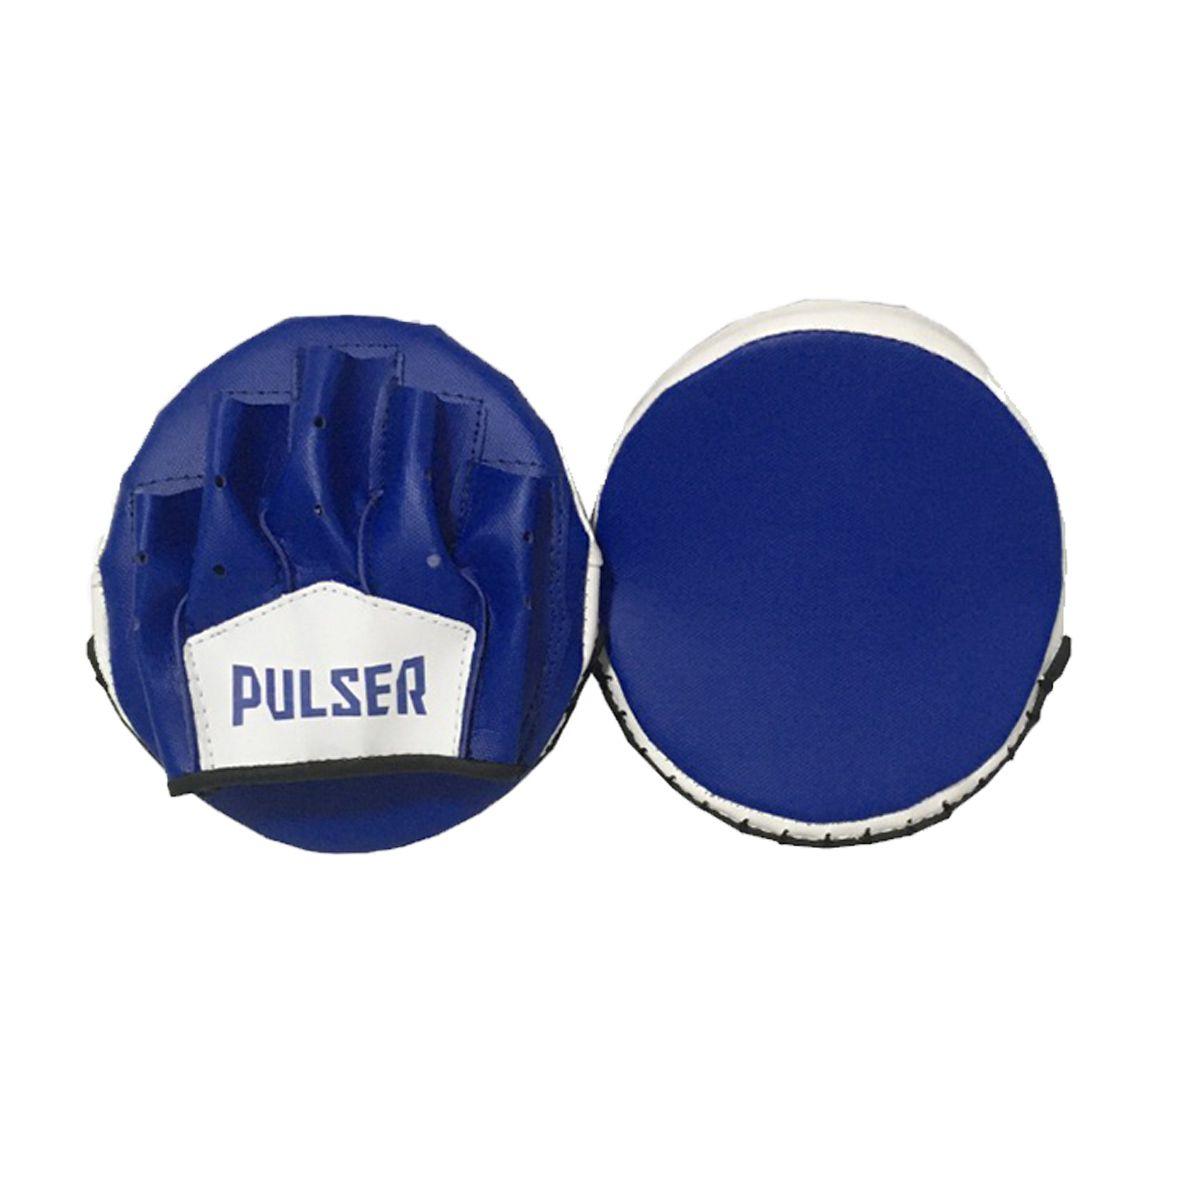 Par de Manopla Luva Foco Rápida - Azul Claro e Branco - Pulser  - PRALUTA SHOP